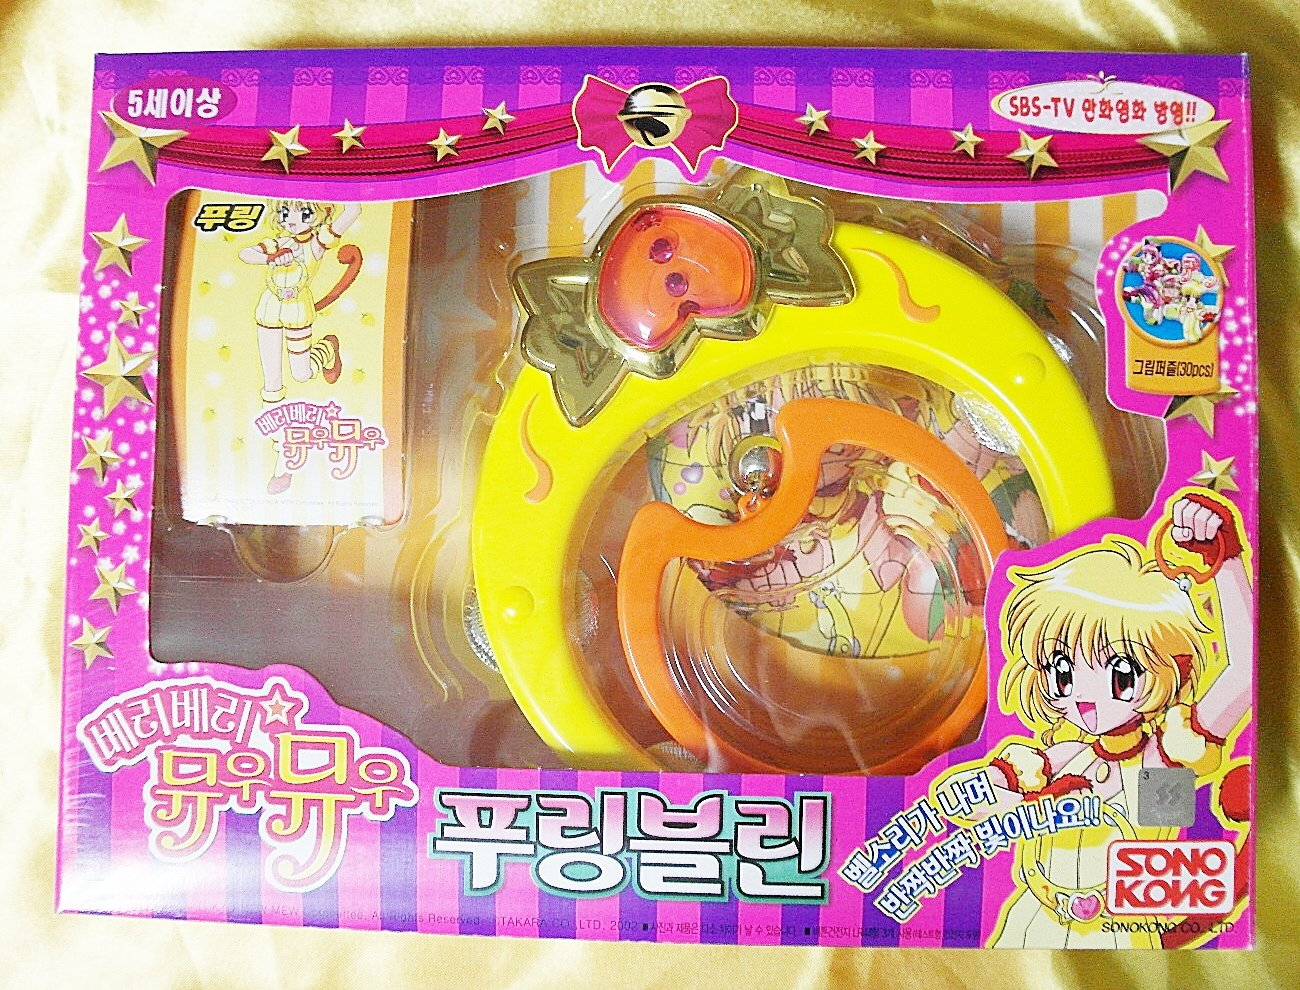 Tokyo Mew Mew Pudding Ring Manga Character Item -Takara Sonokong